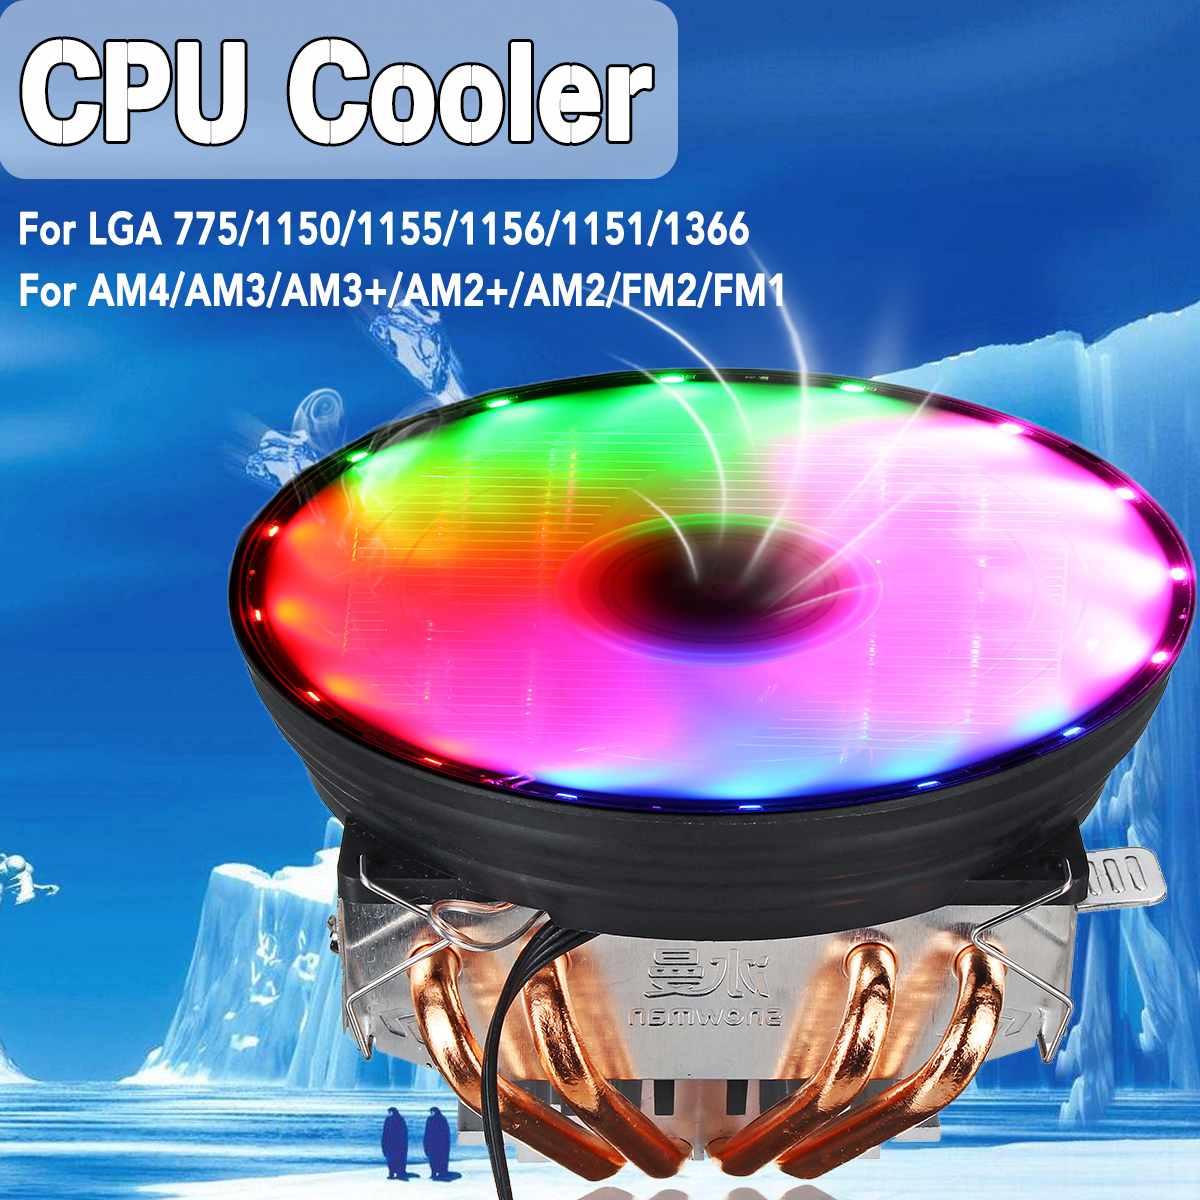 LED CPU Cooler Fan Heatsink Radiator For Intel LGA 1150/1151